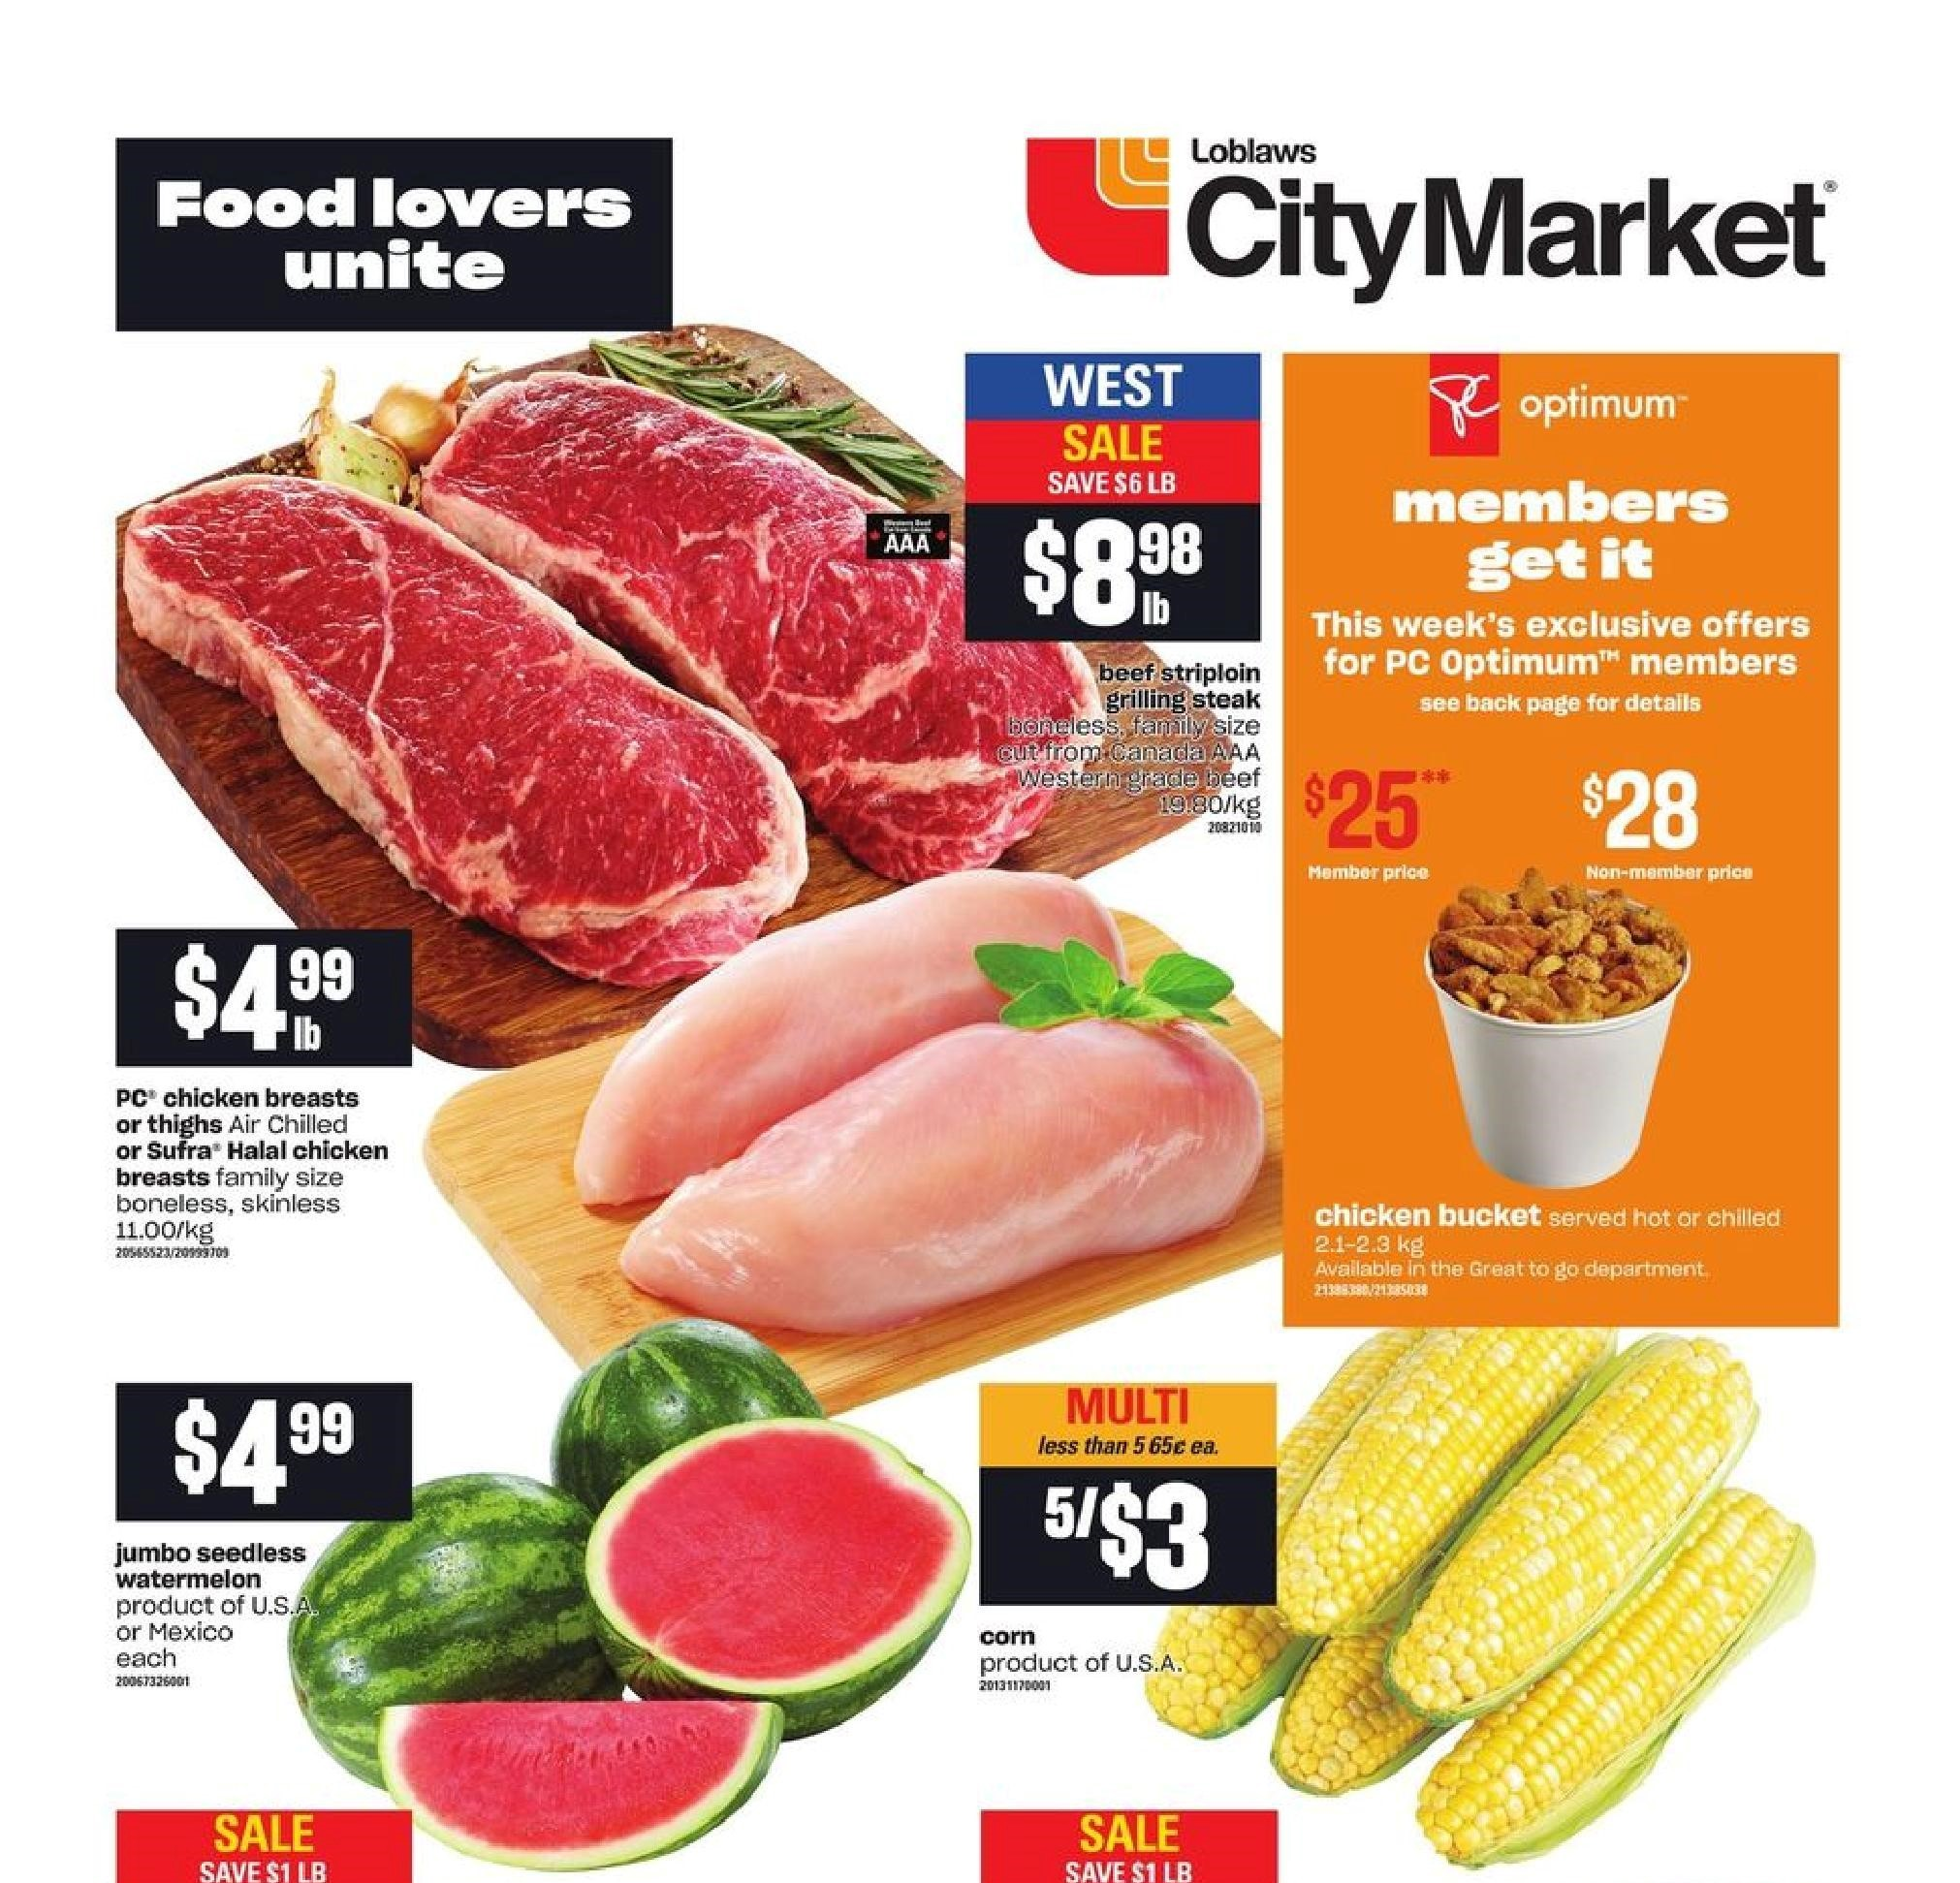 Loblaws City Market BC Flyer May 20